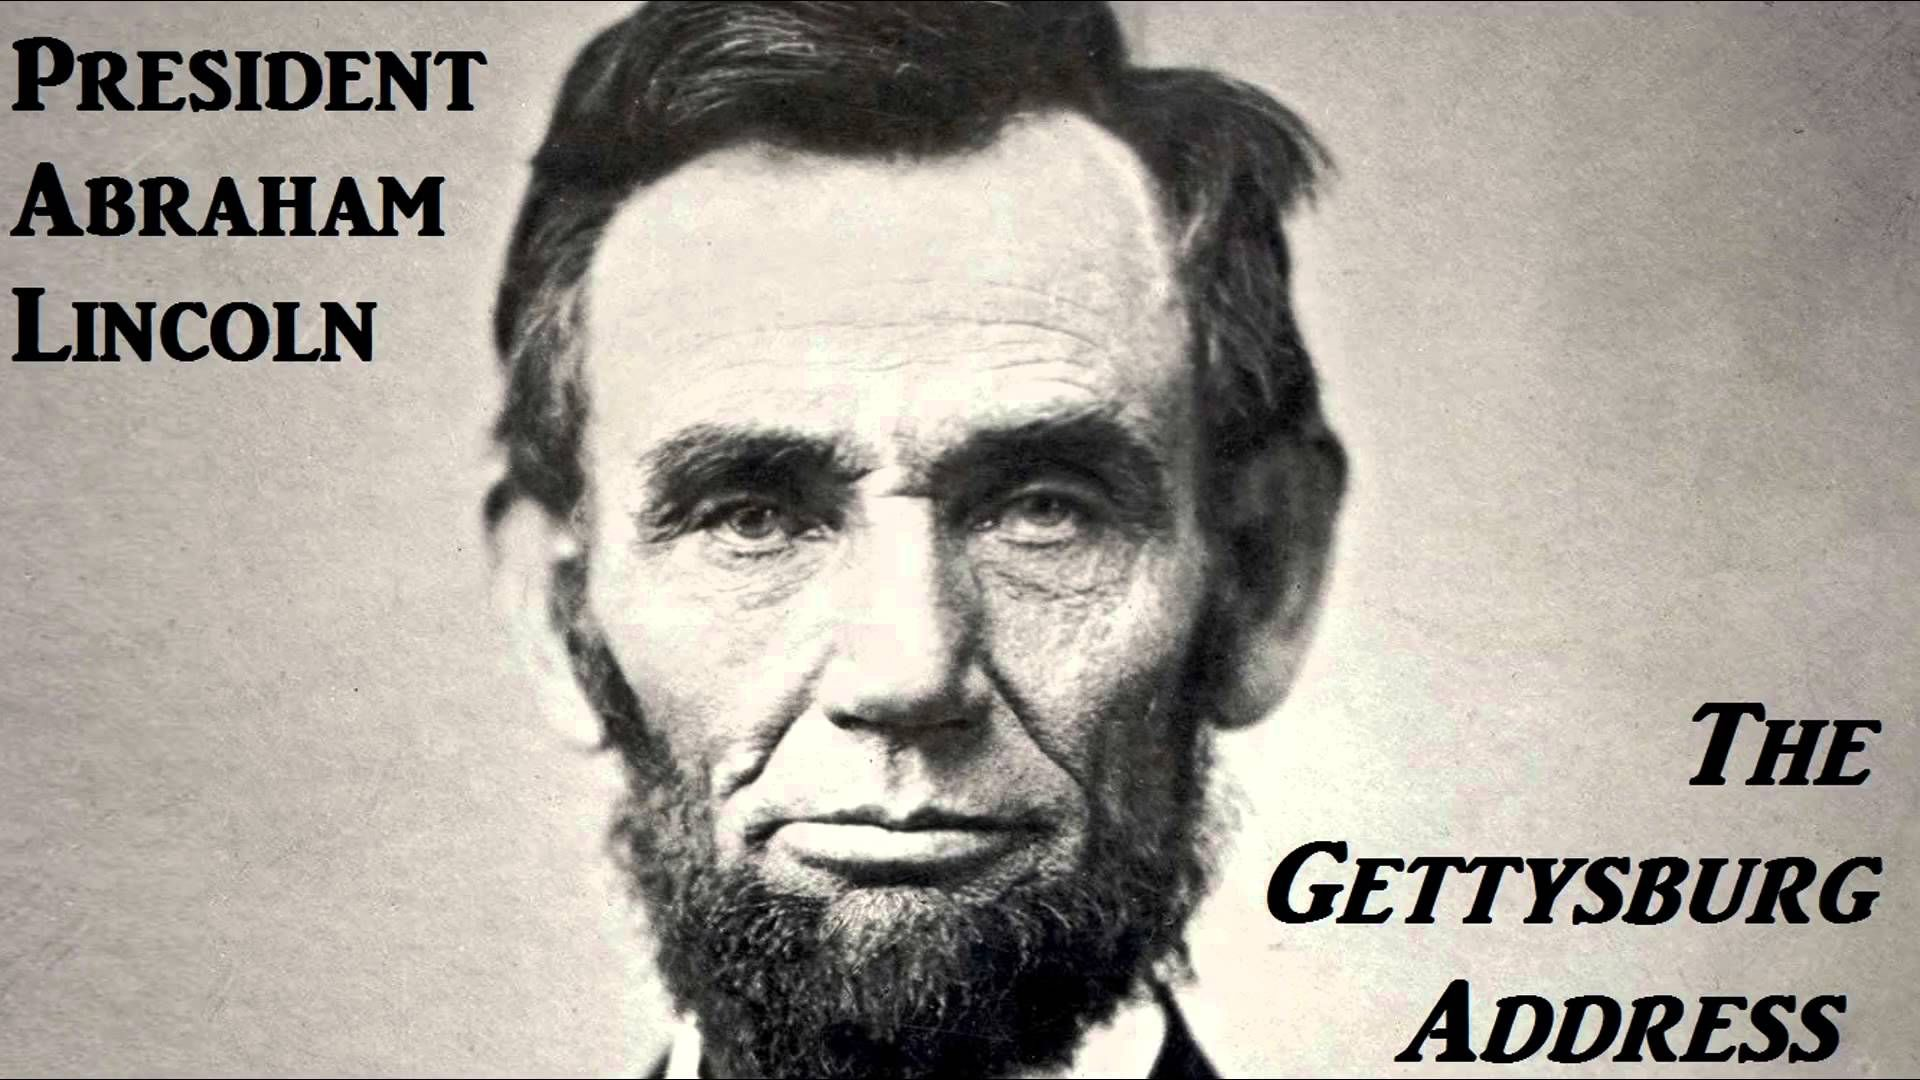 The Gettysburg Address By President Abraham Lincoln Full